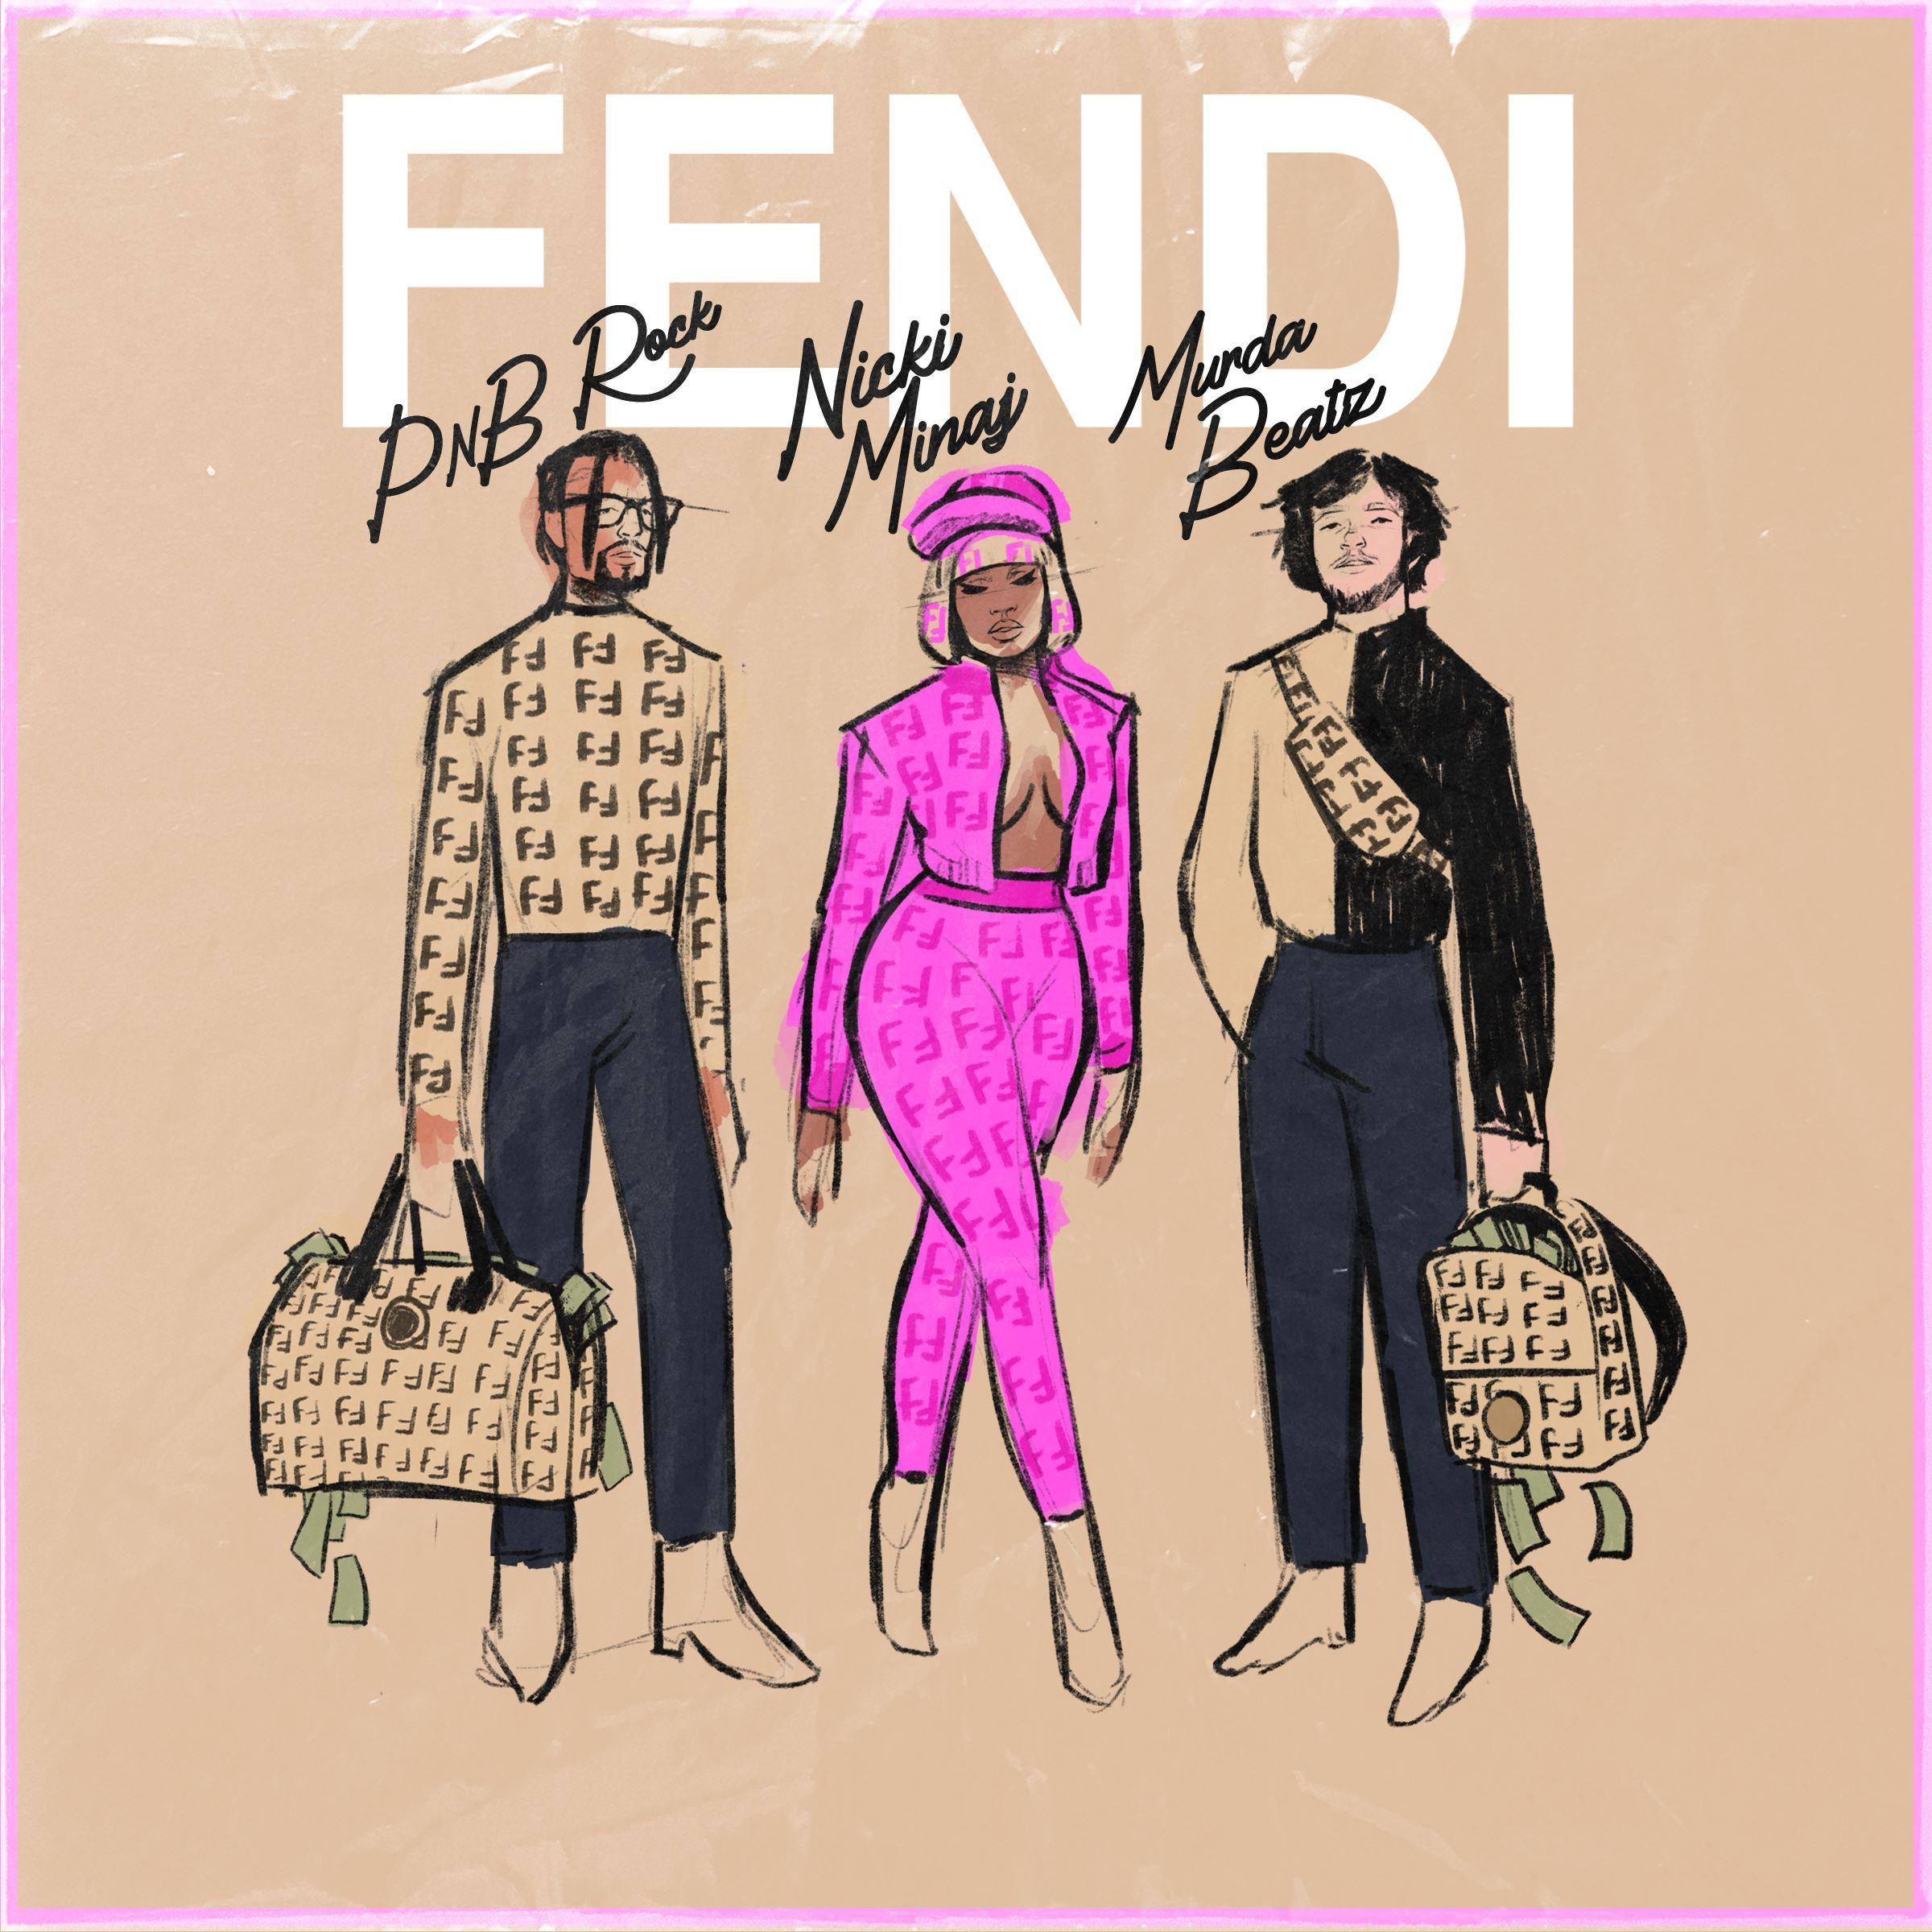 Fendi (song)